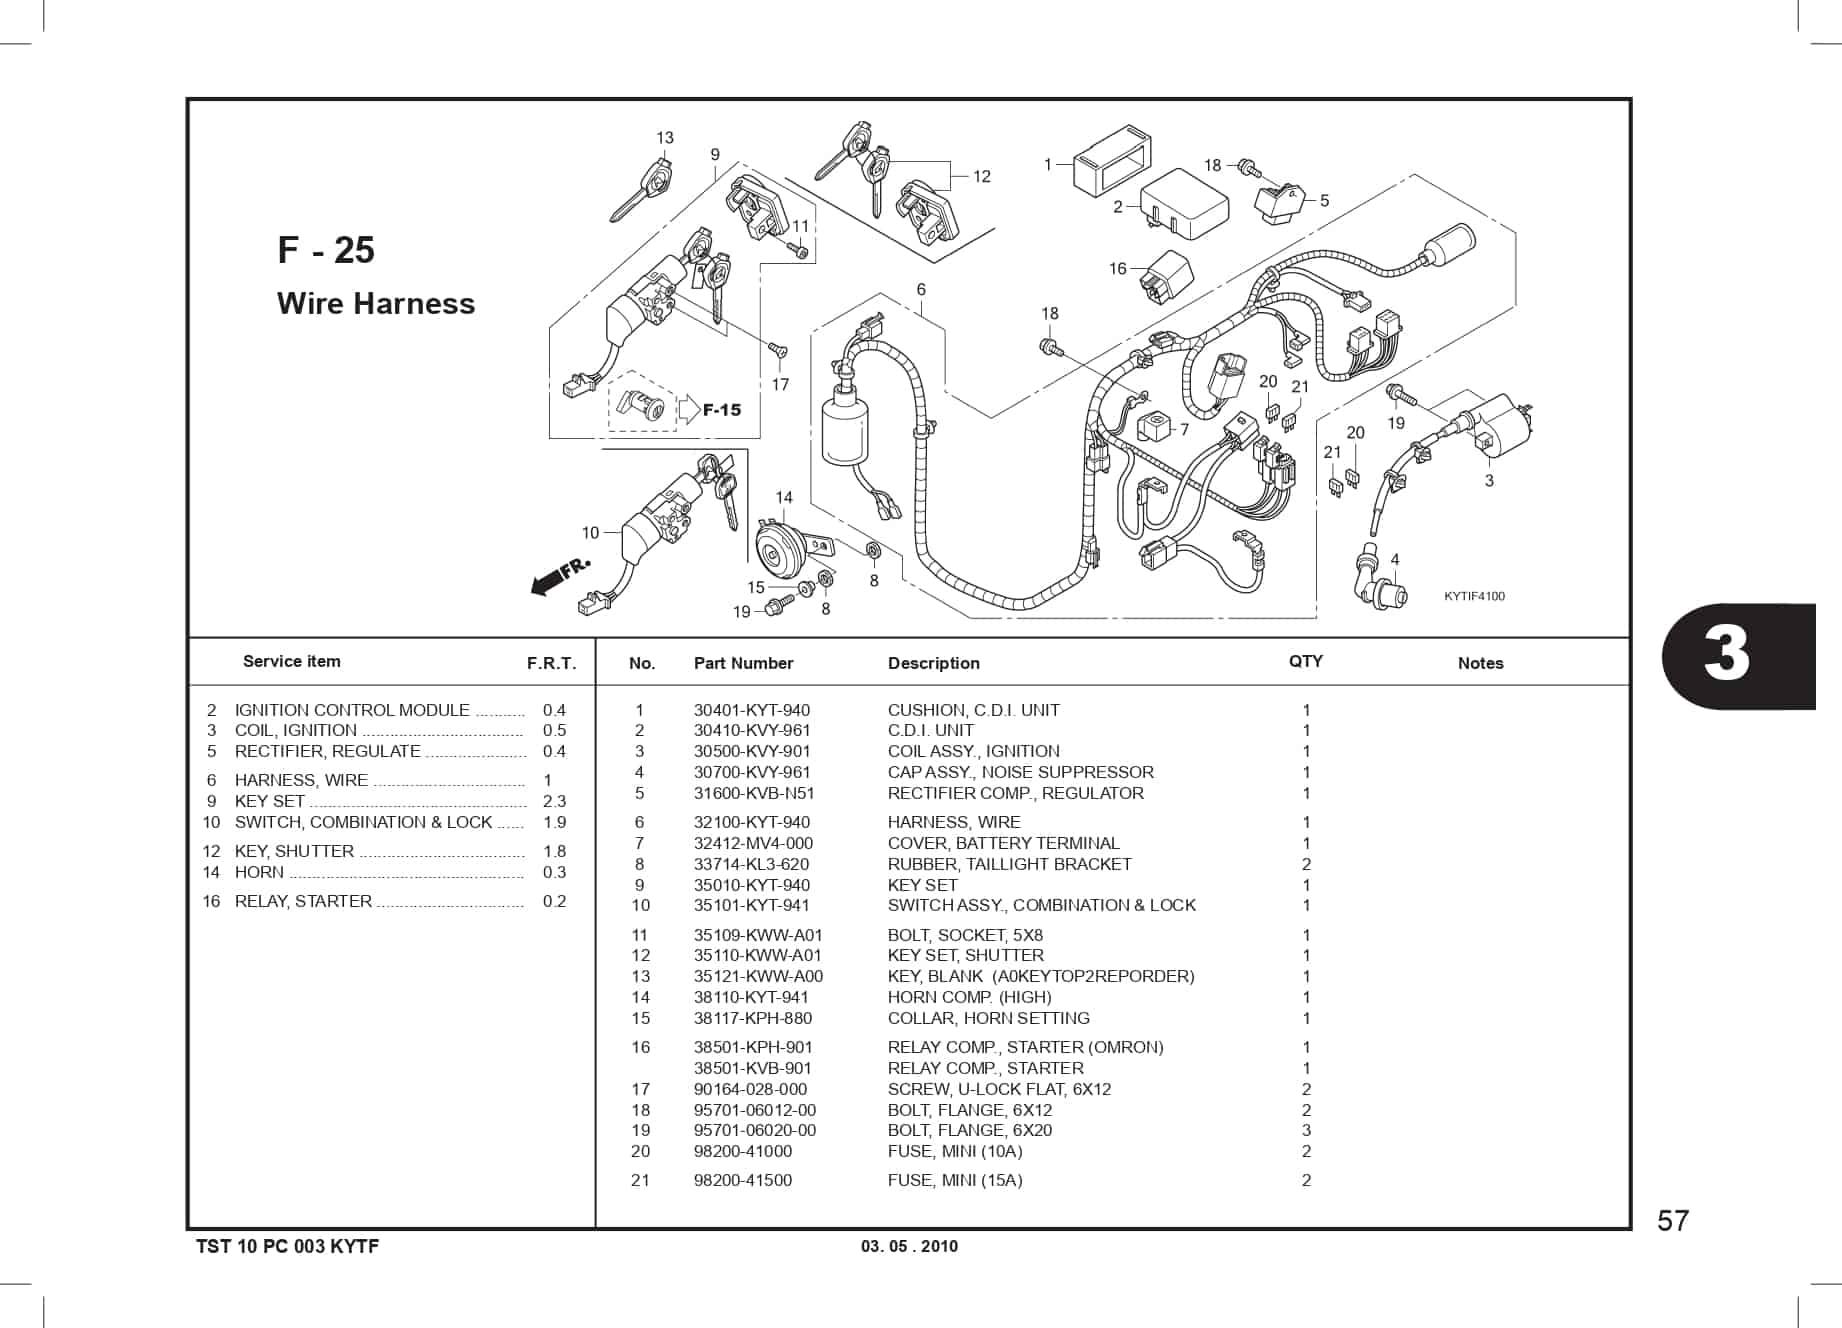 F-25 Wire Harness